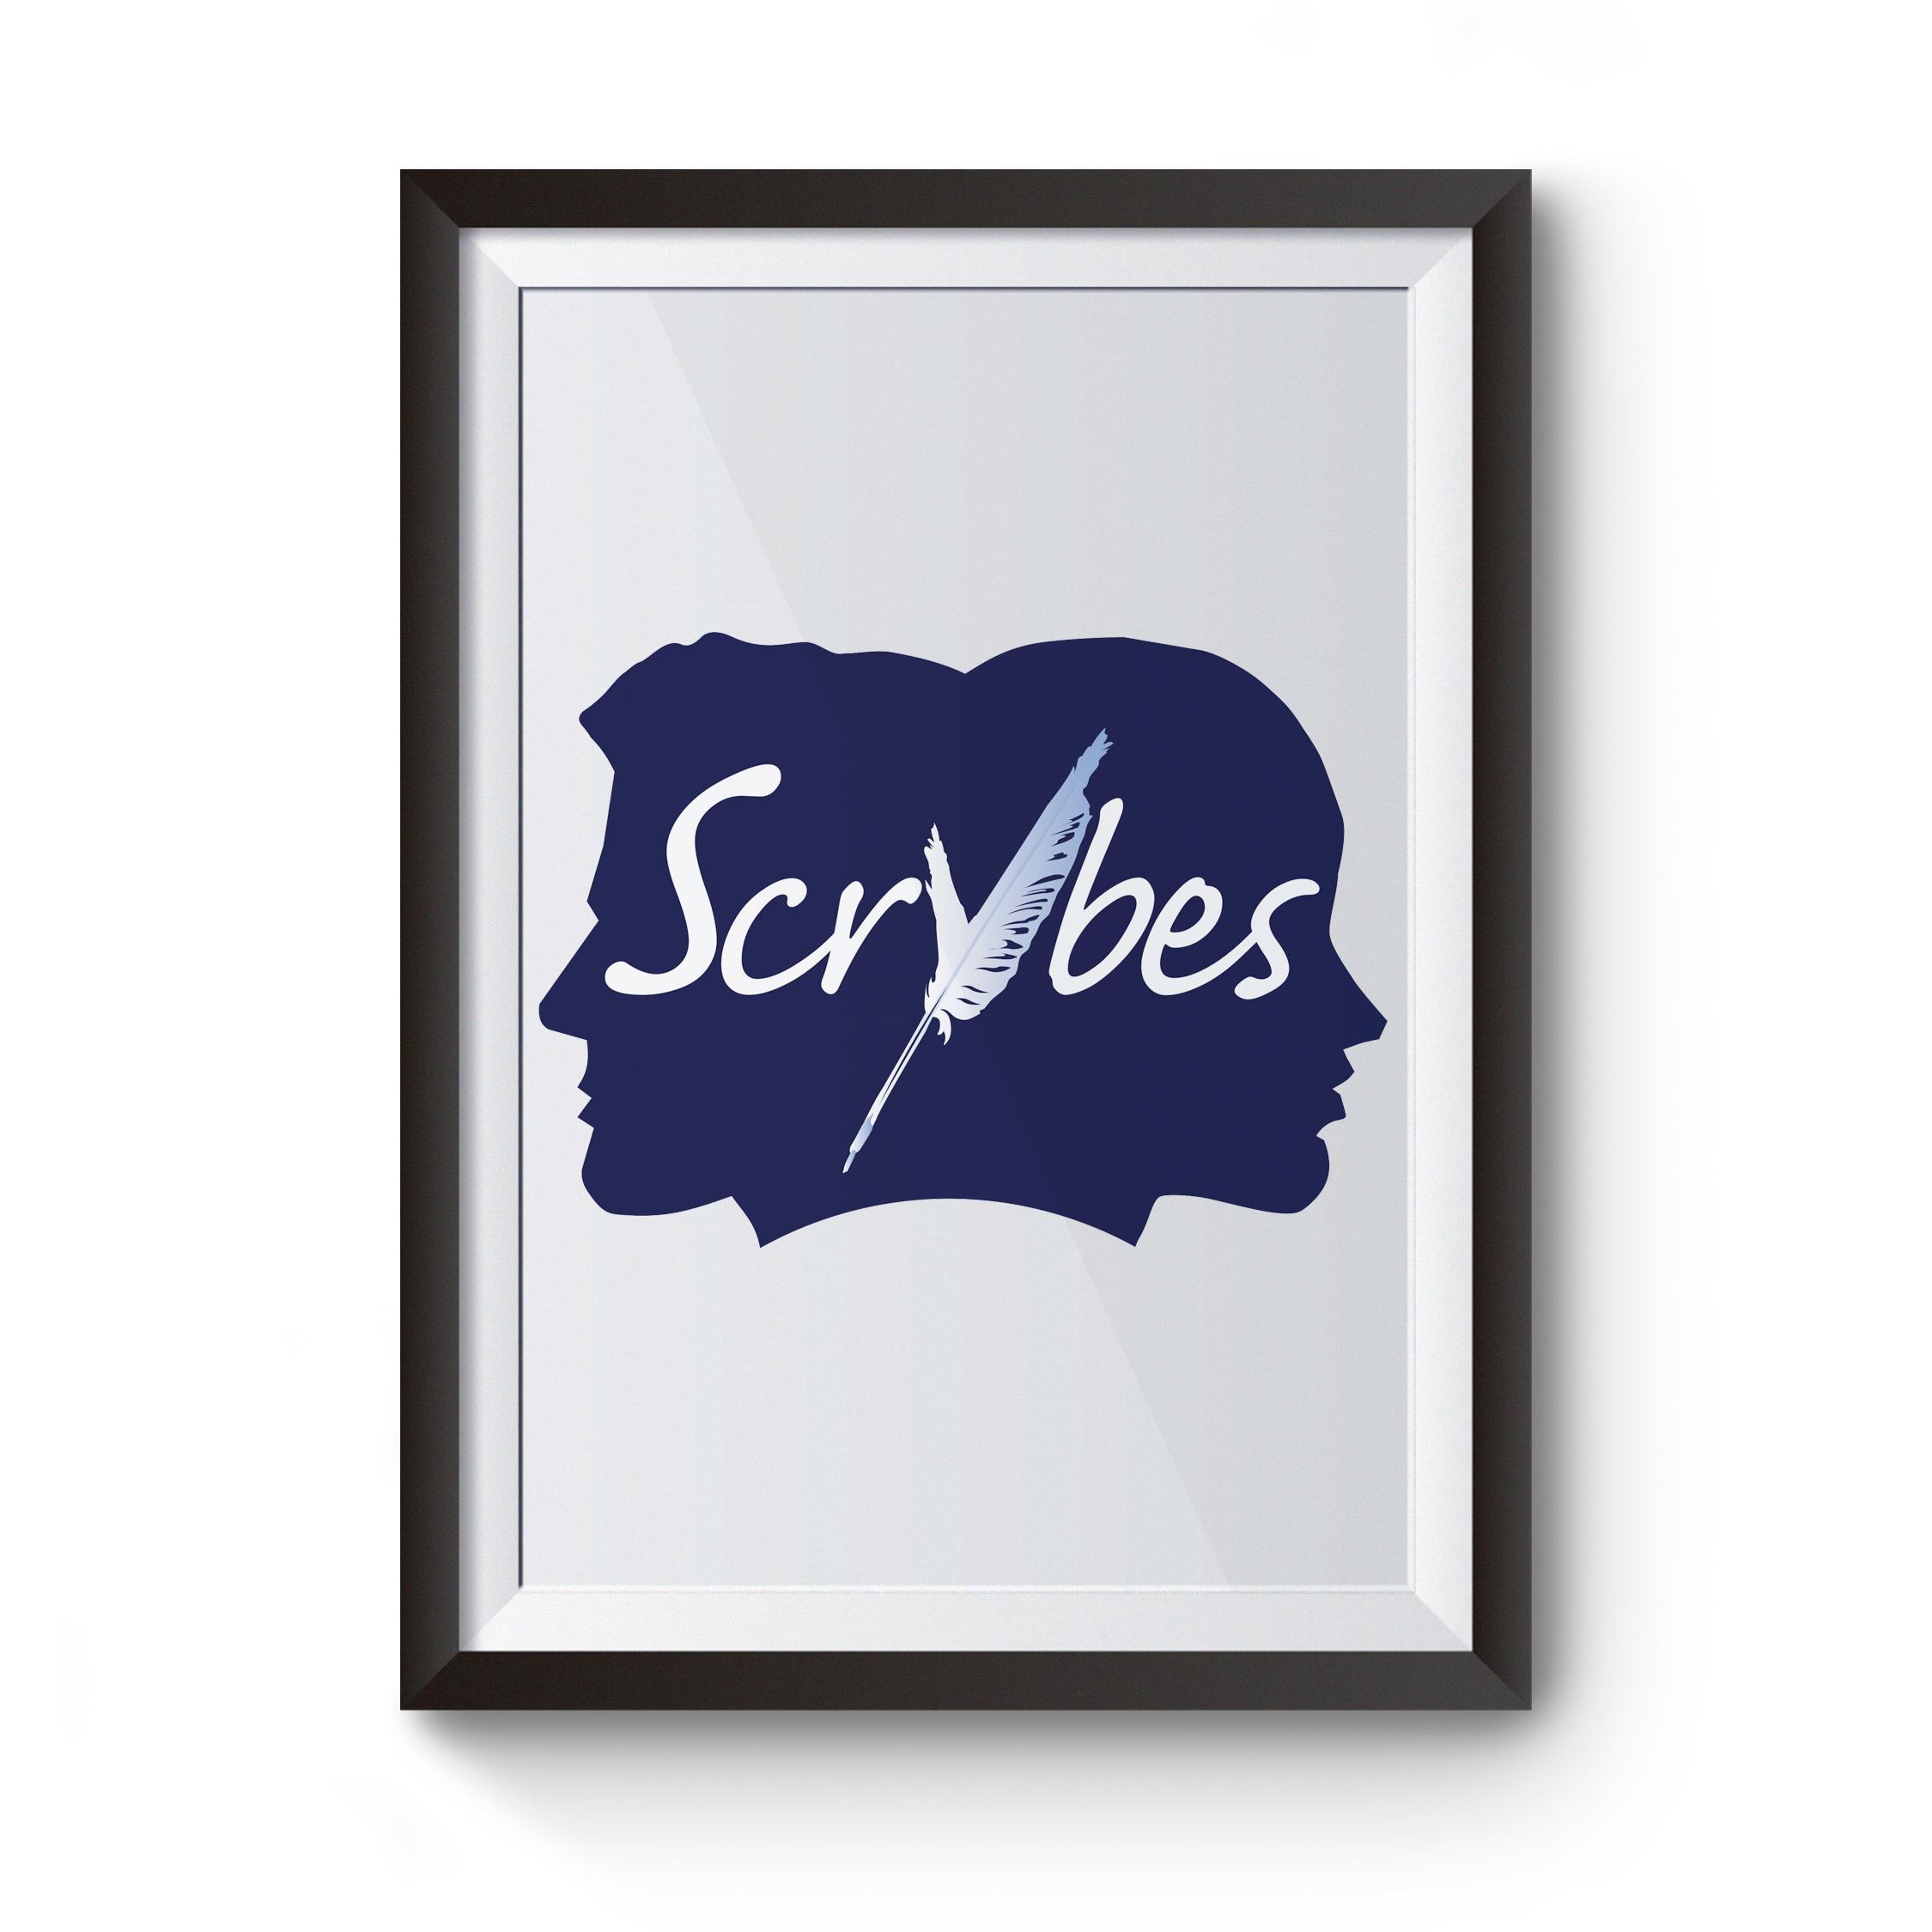 twoscrybes_logo.jpg